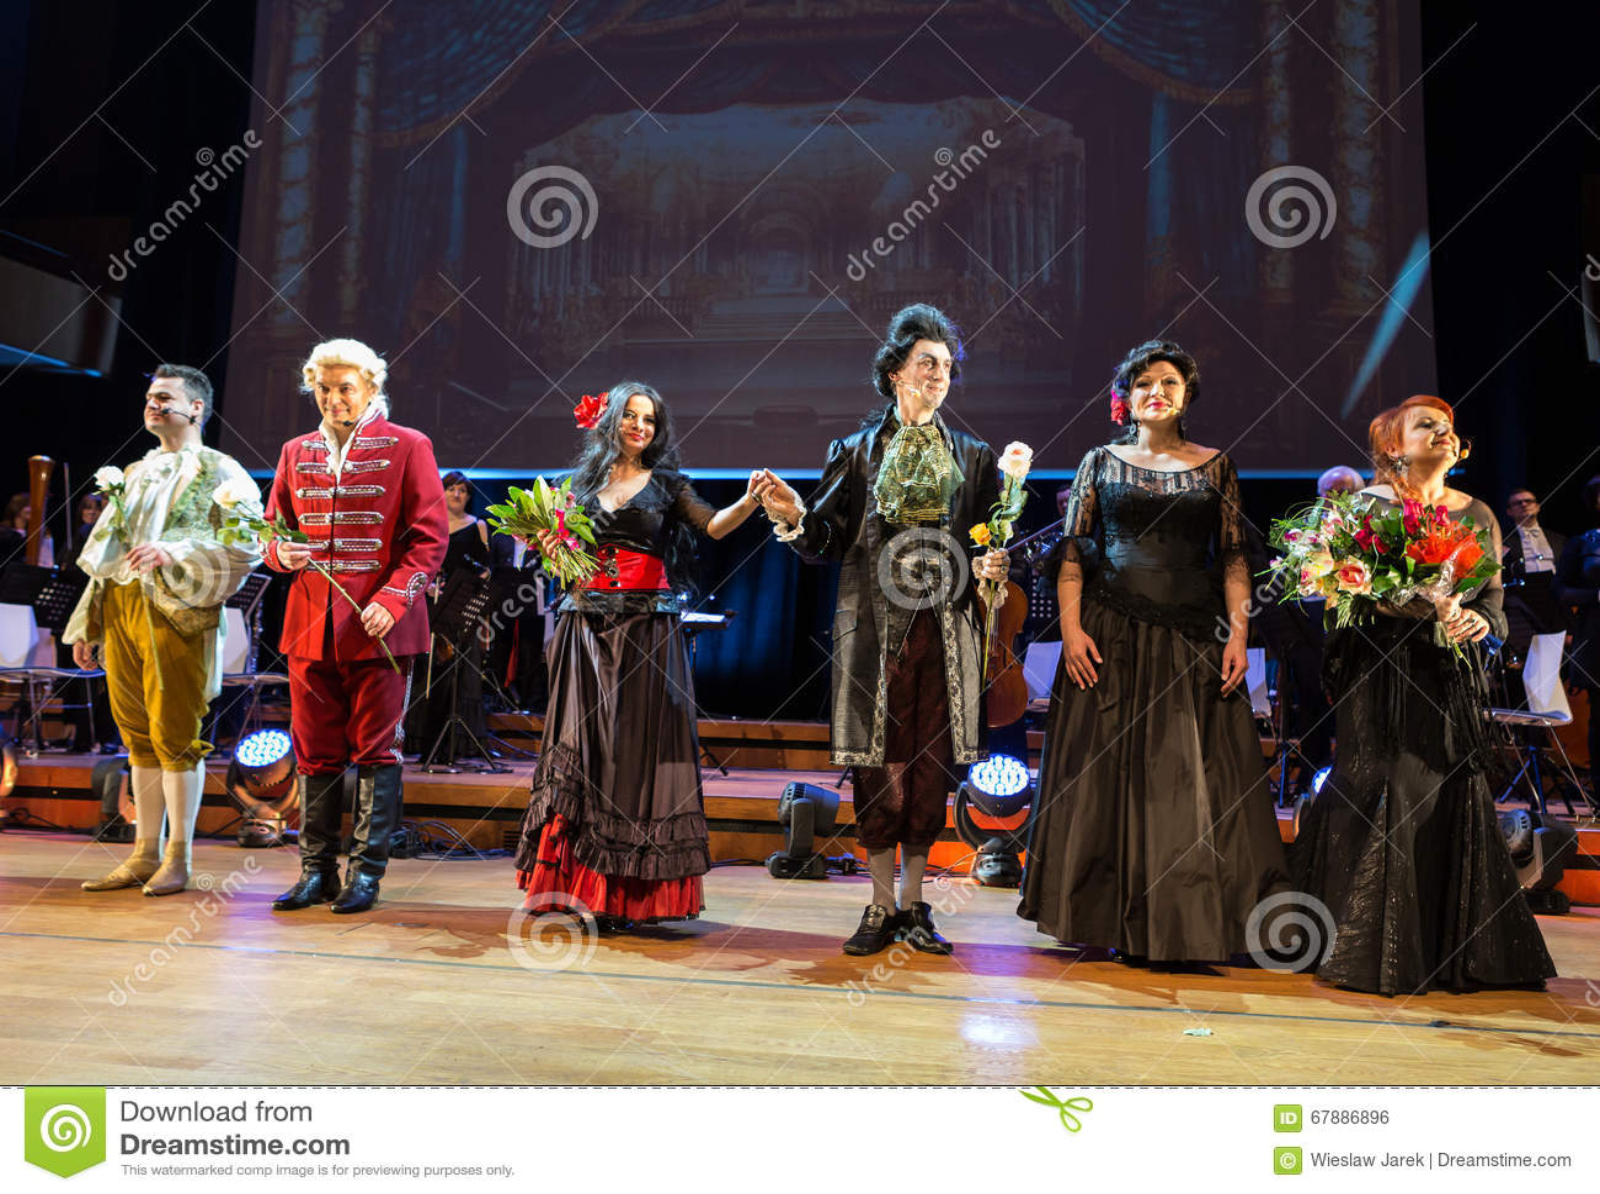 Spectacle featuring Filharmonia Futura and M. Walewska - Opera Is Life,